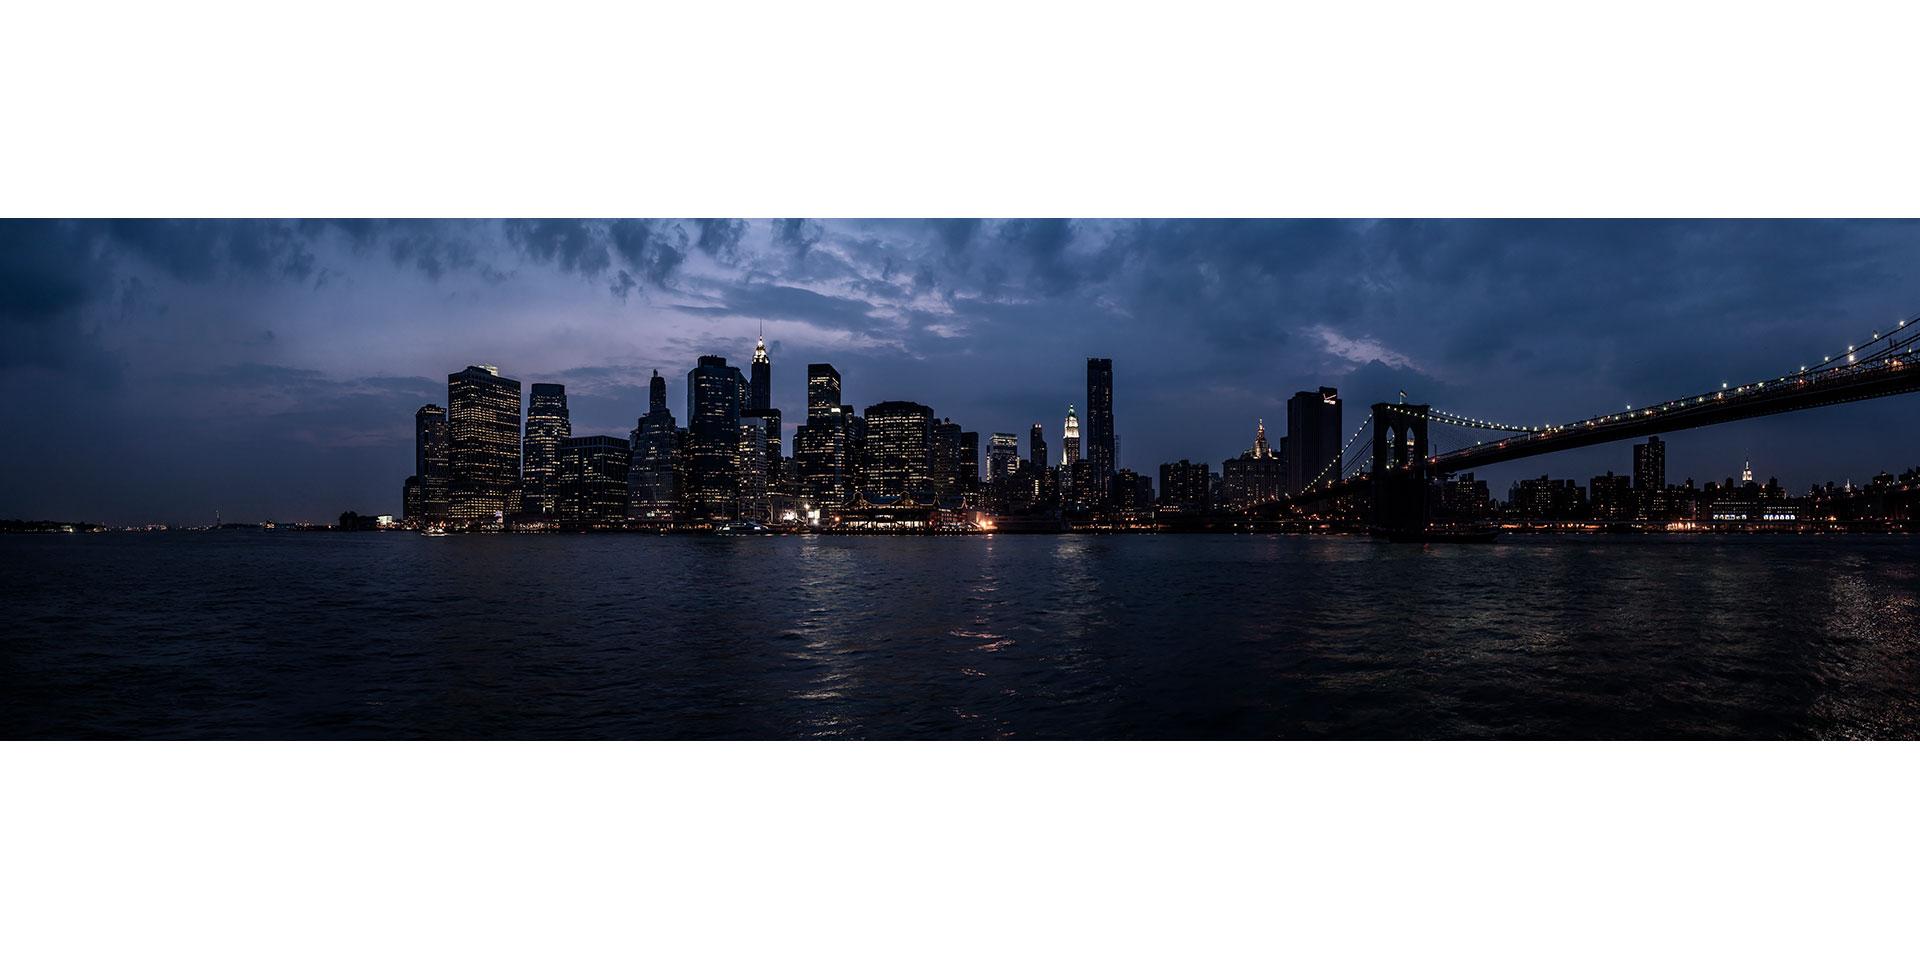 New York | Brooklyn Bridge | Financial District - New York City - USA